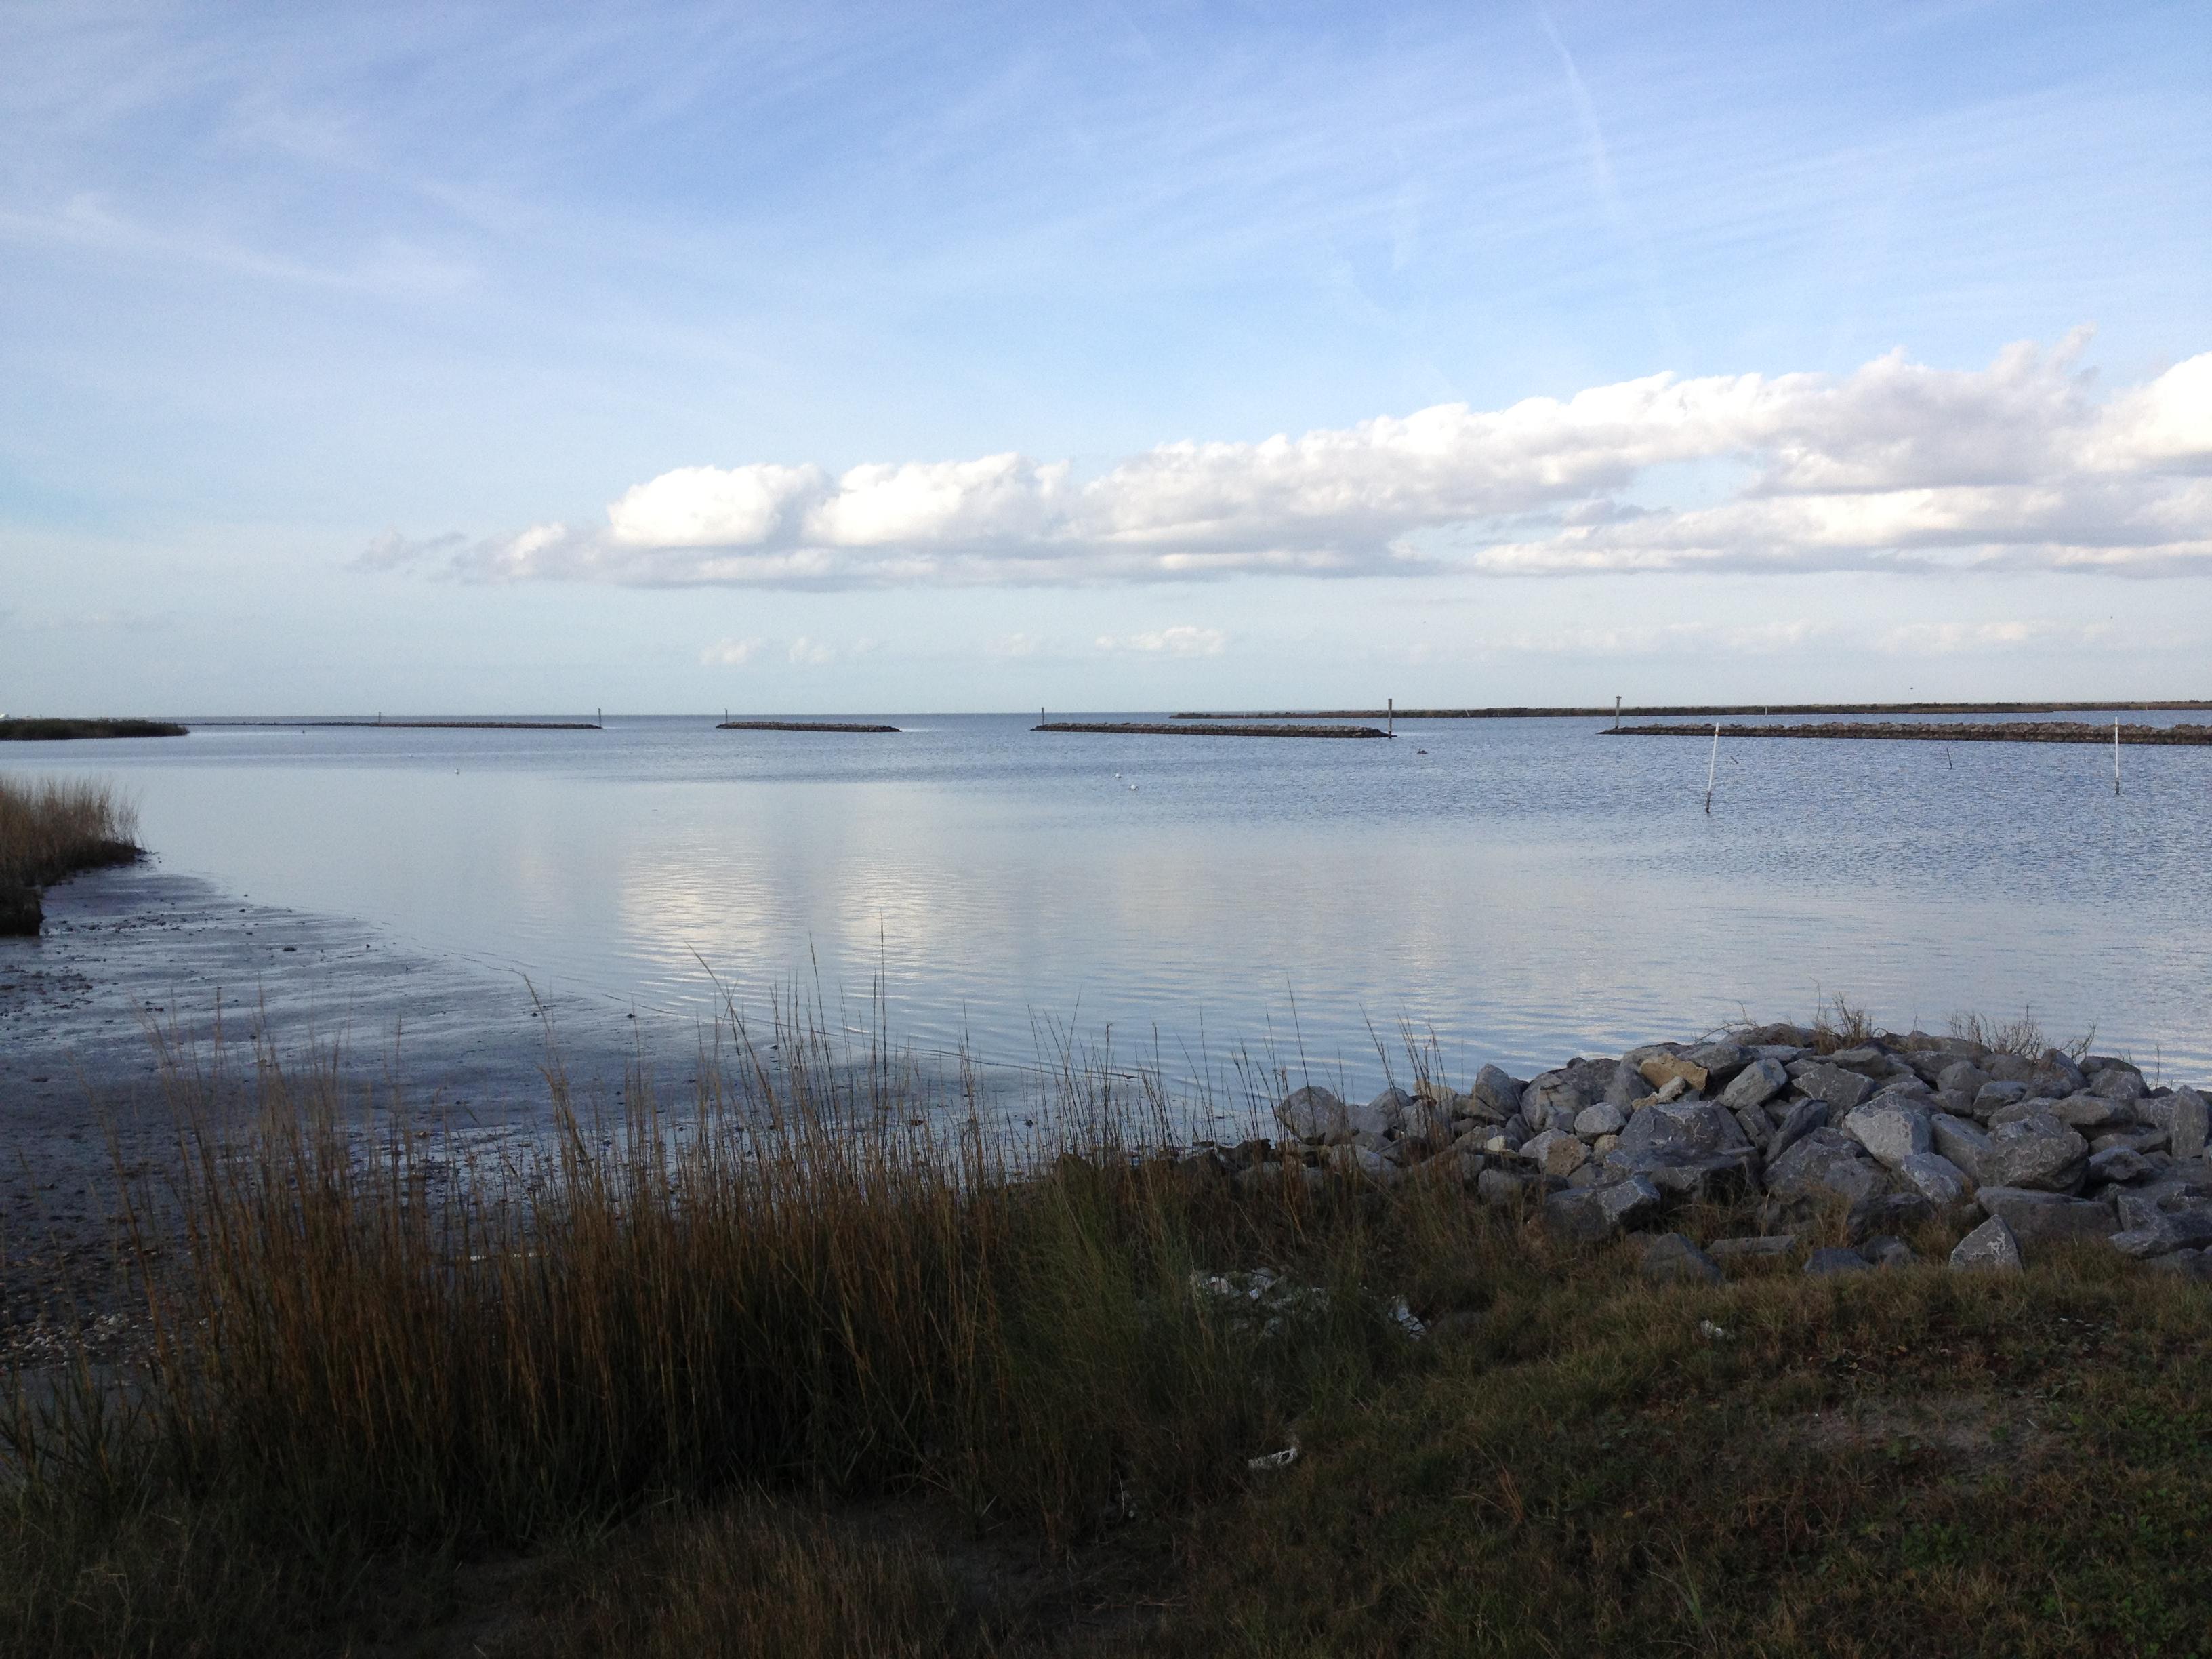 Fee increase louisiana lagniappe for Louisiana saltwater fishing license